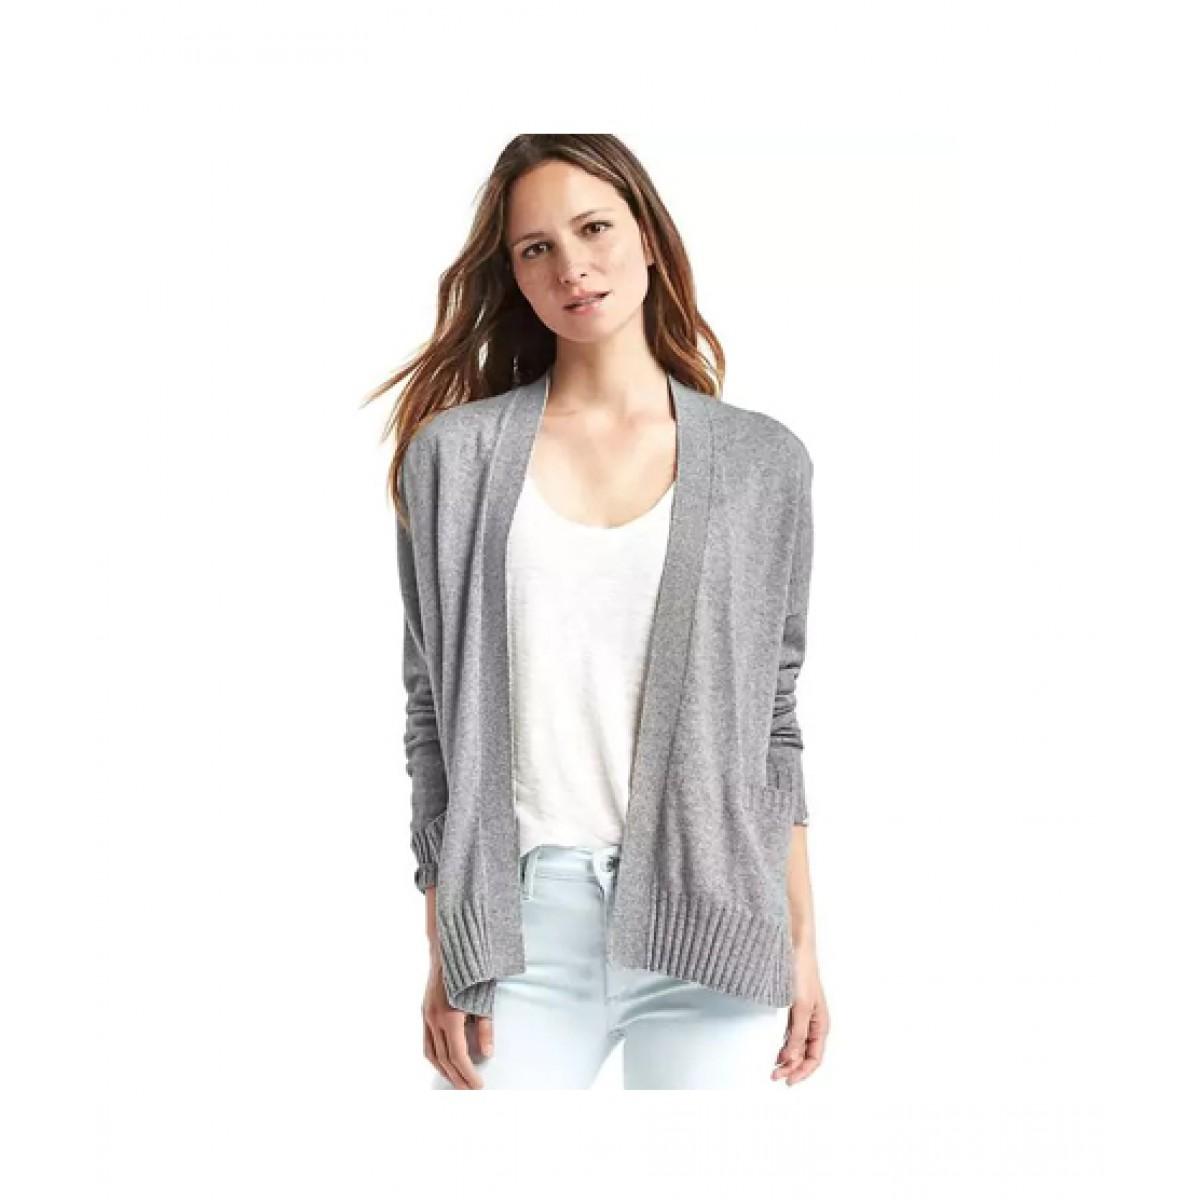 90c75bf69754df Gap Open Cardigan Women's Sweater Price in Pakistan   Buy Gap Merino Wool  Blend Open Sweater Heather Grey   iShopping.pk